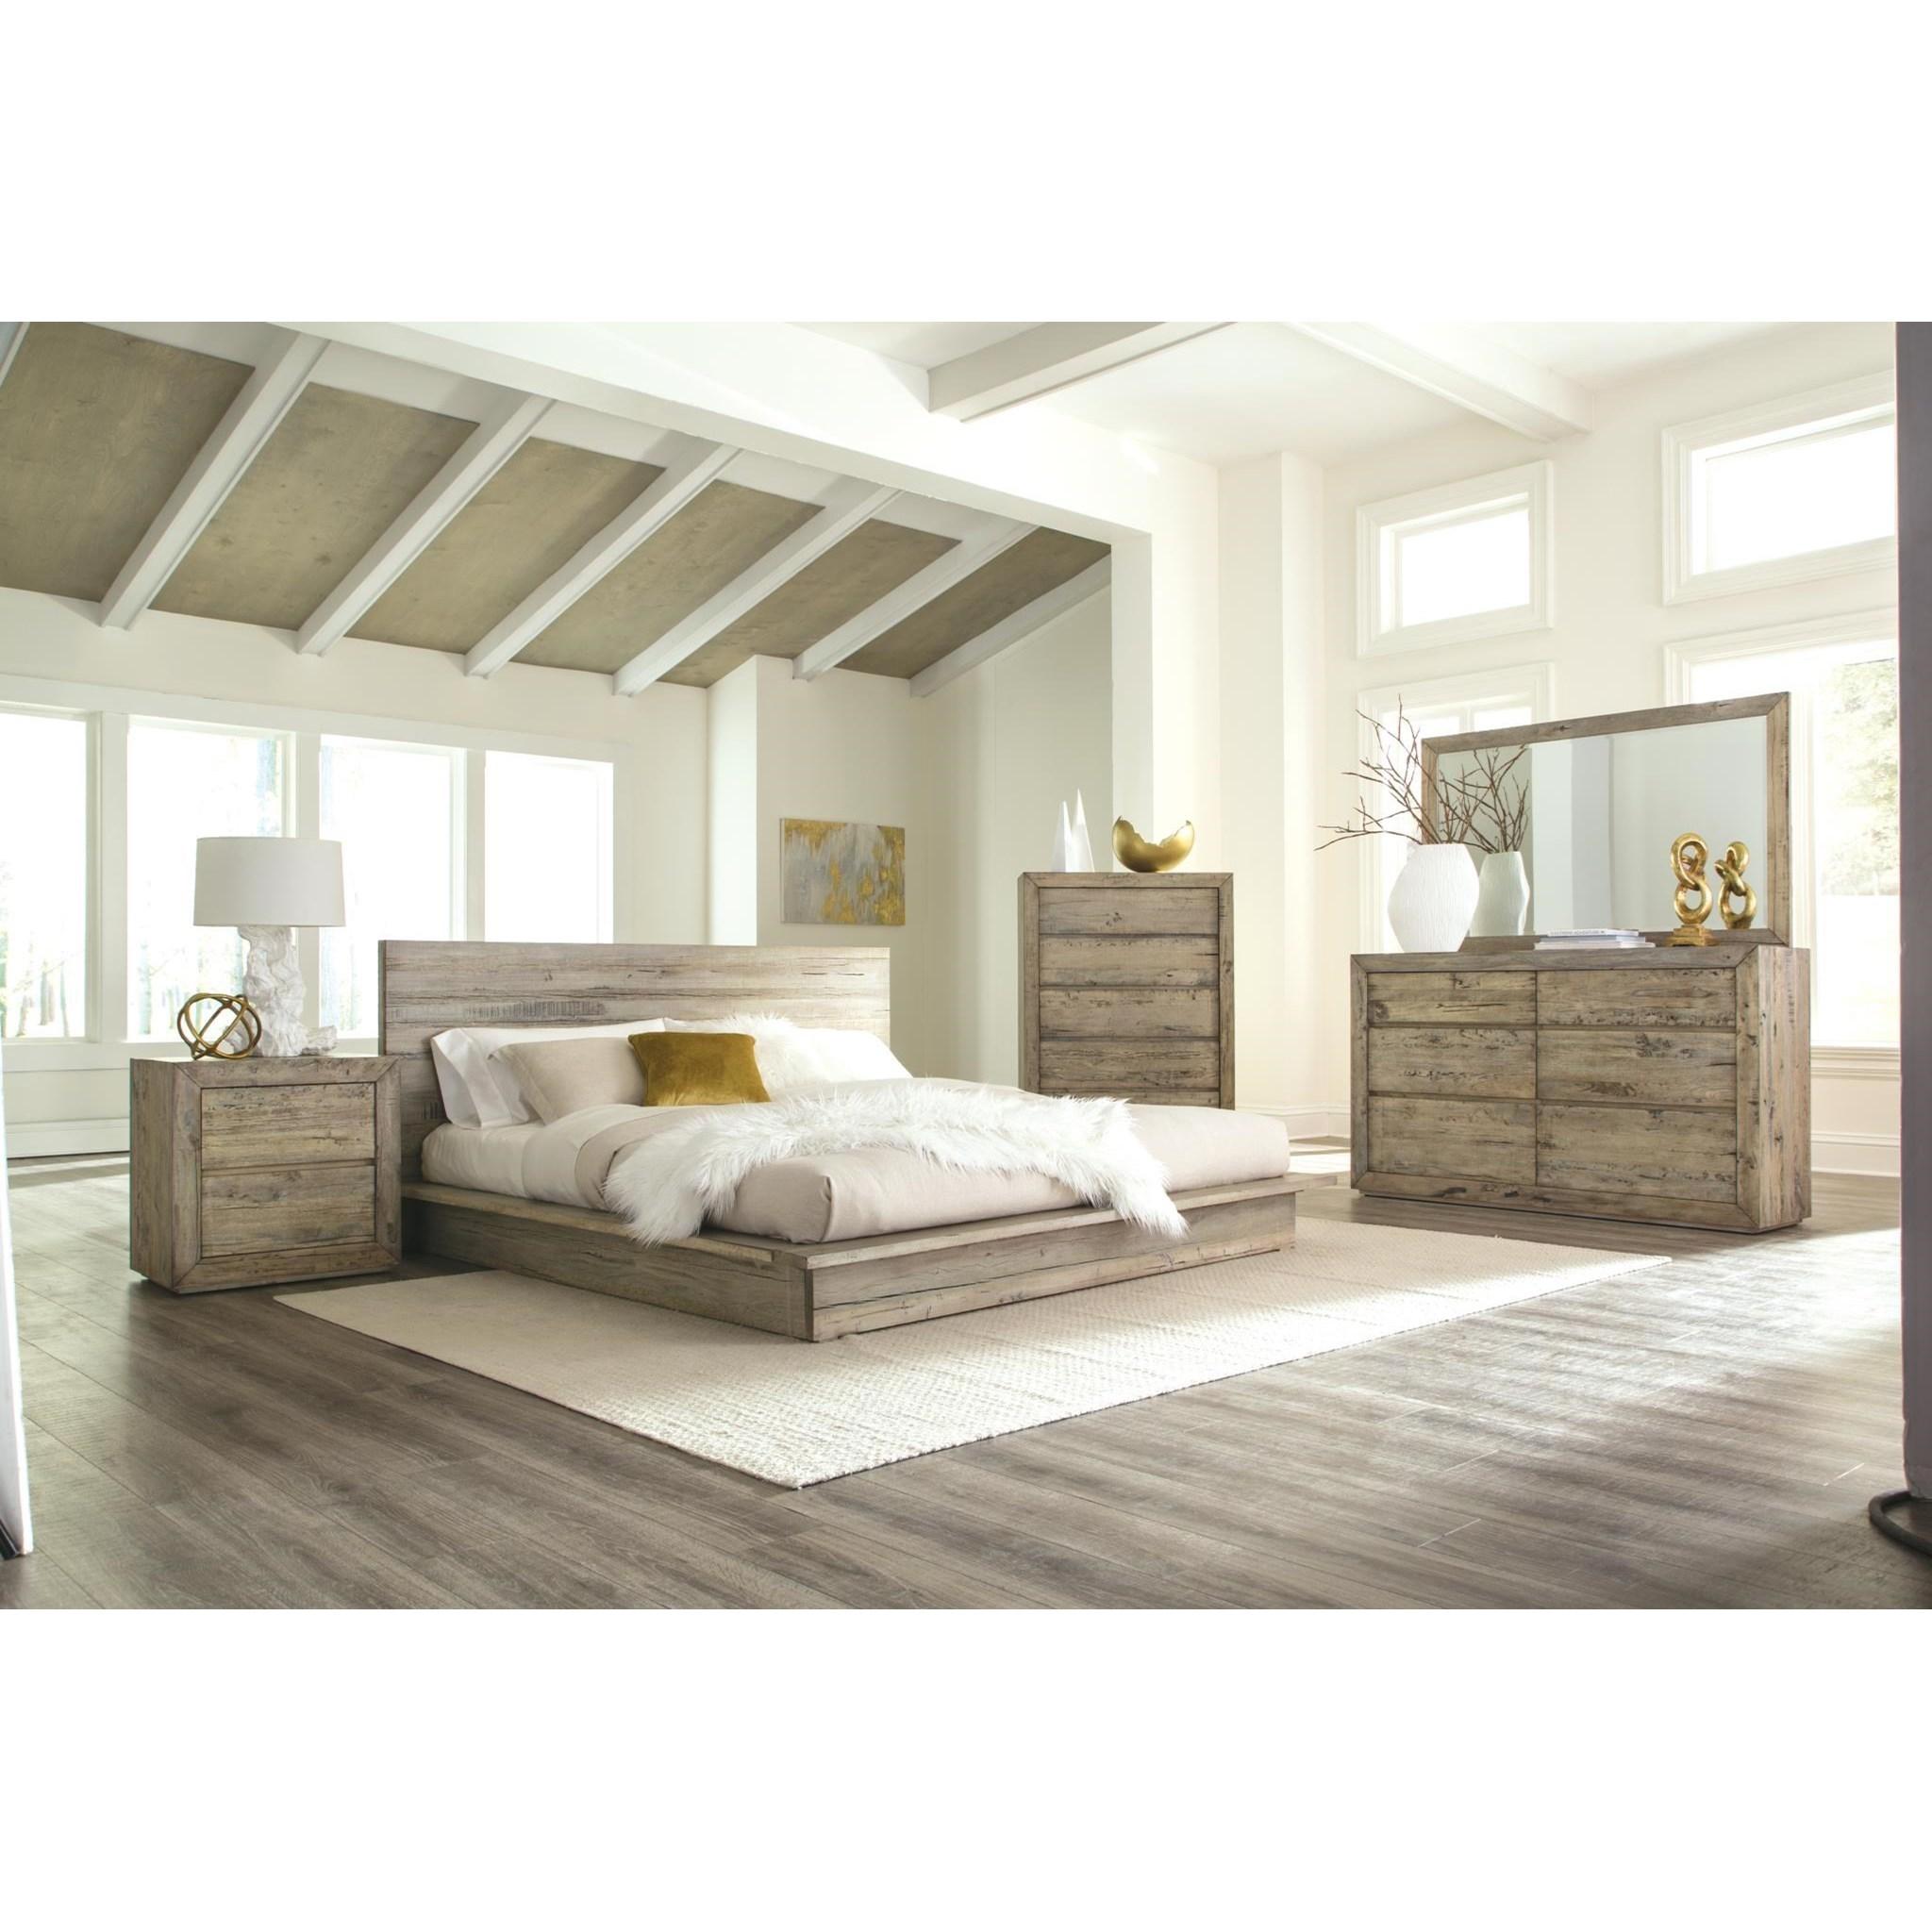 Renewal California King Bedroom Group by Napa Furniture Designs at HomeWorld Furniture